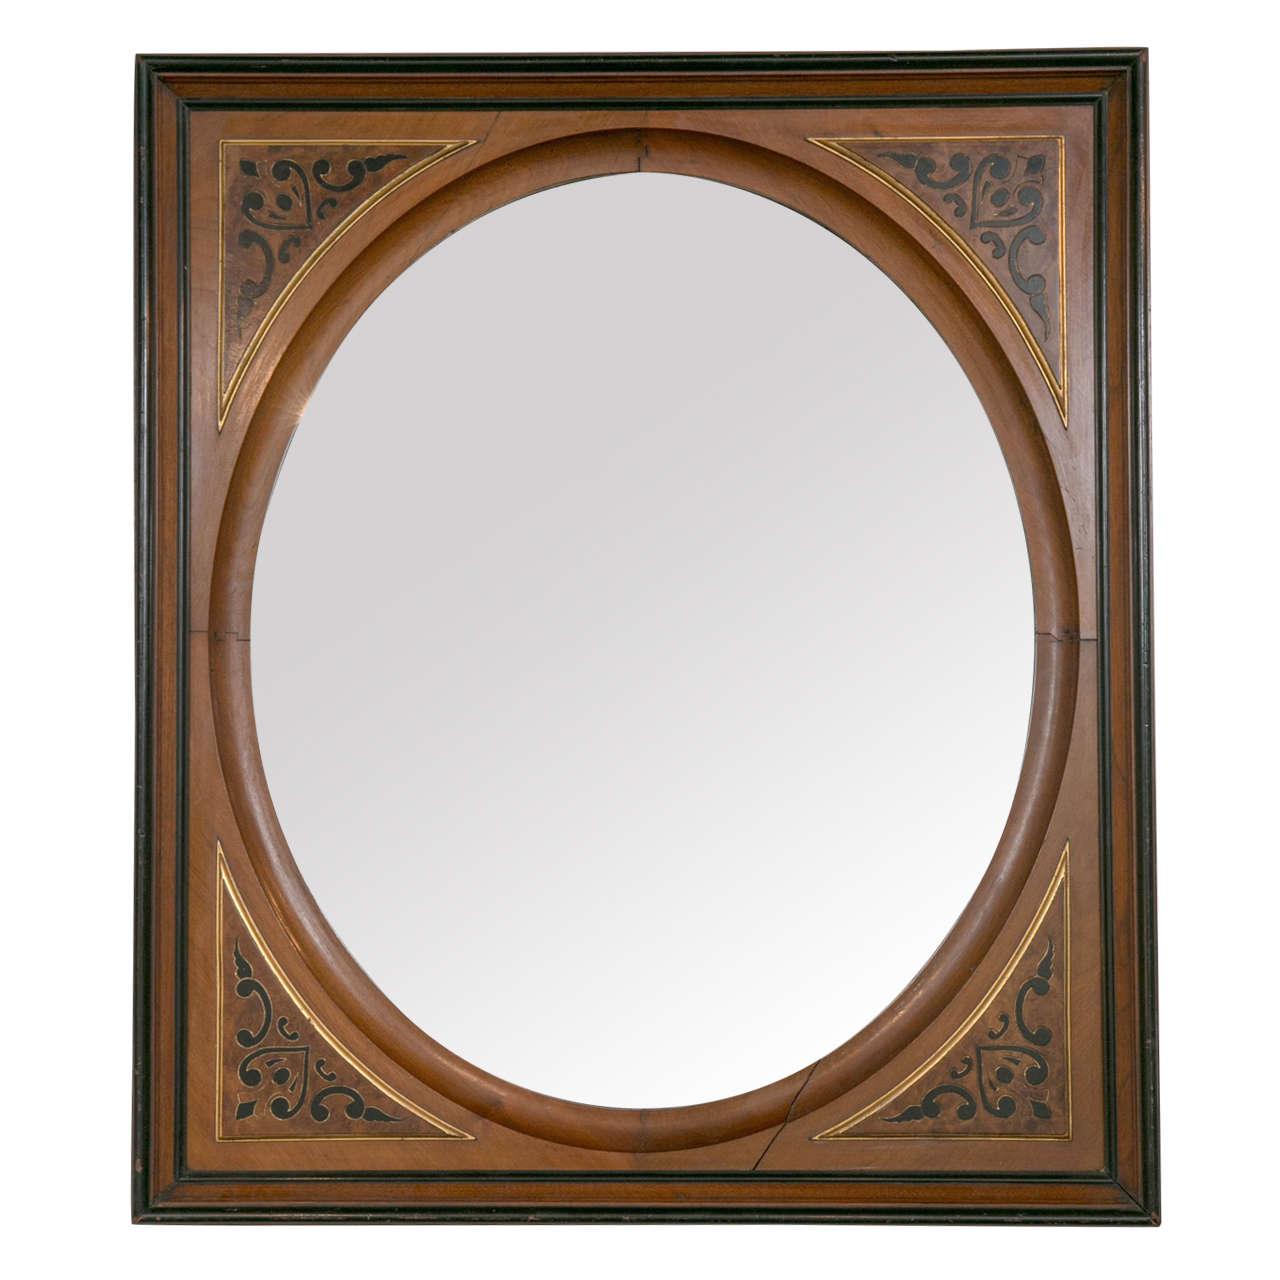 Large edwardian portrait frame mirror for sale at 1stdibs for Large framed mirrors for sale